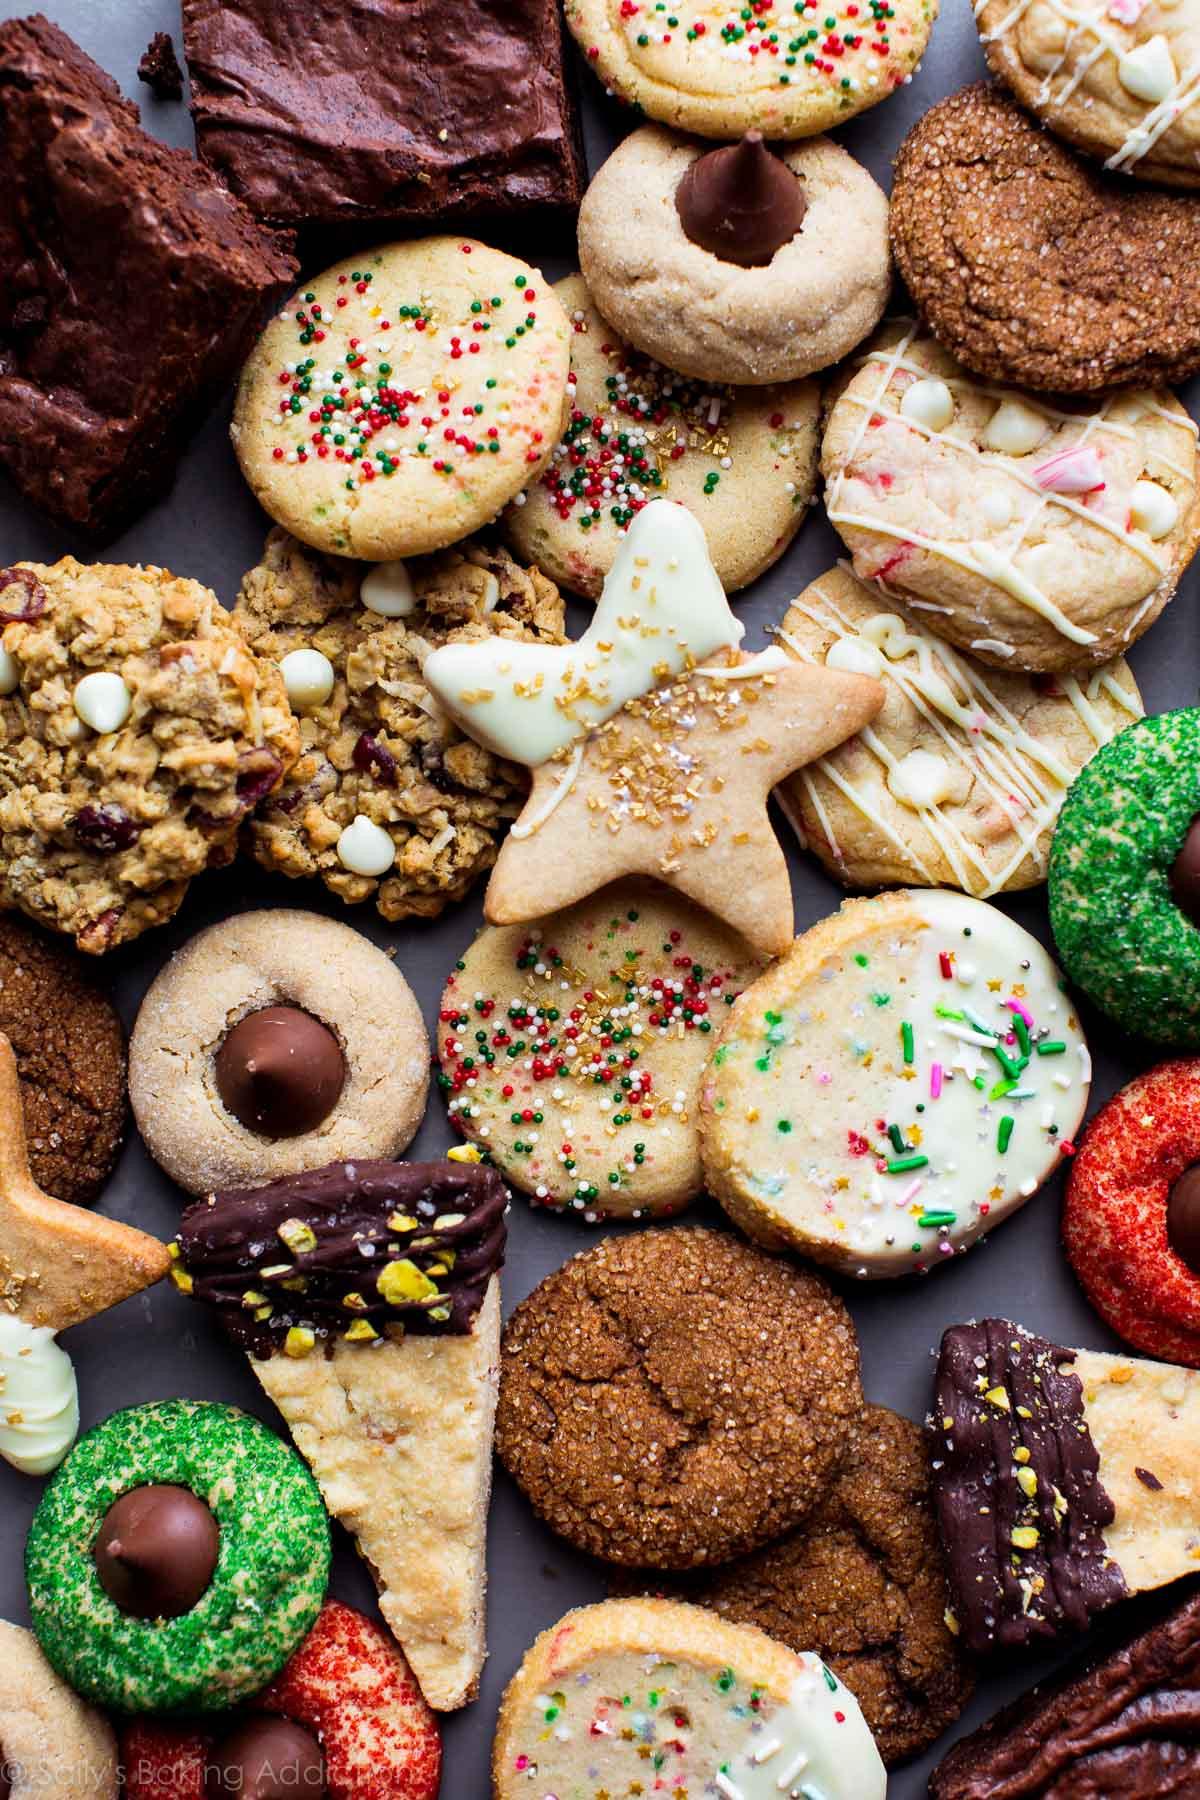 Christmas Baking Reciepes  50 Fun and Festive Christmas Cookies Sallys Baking